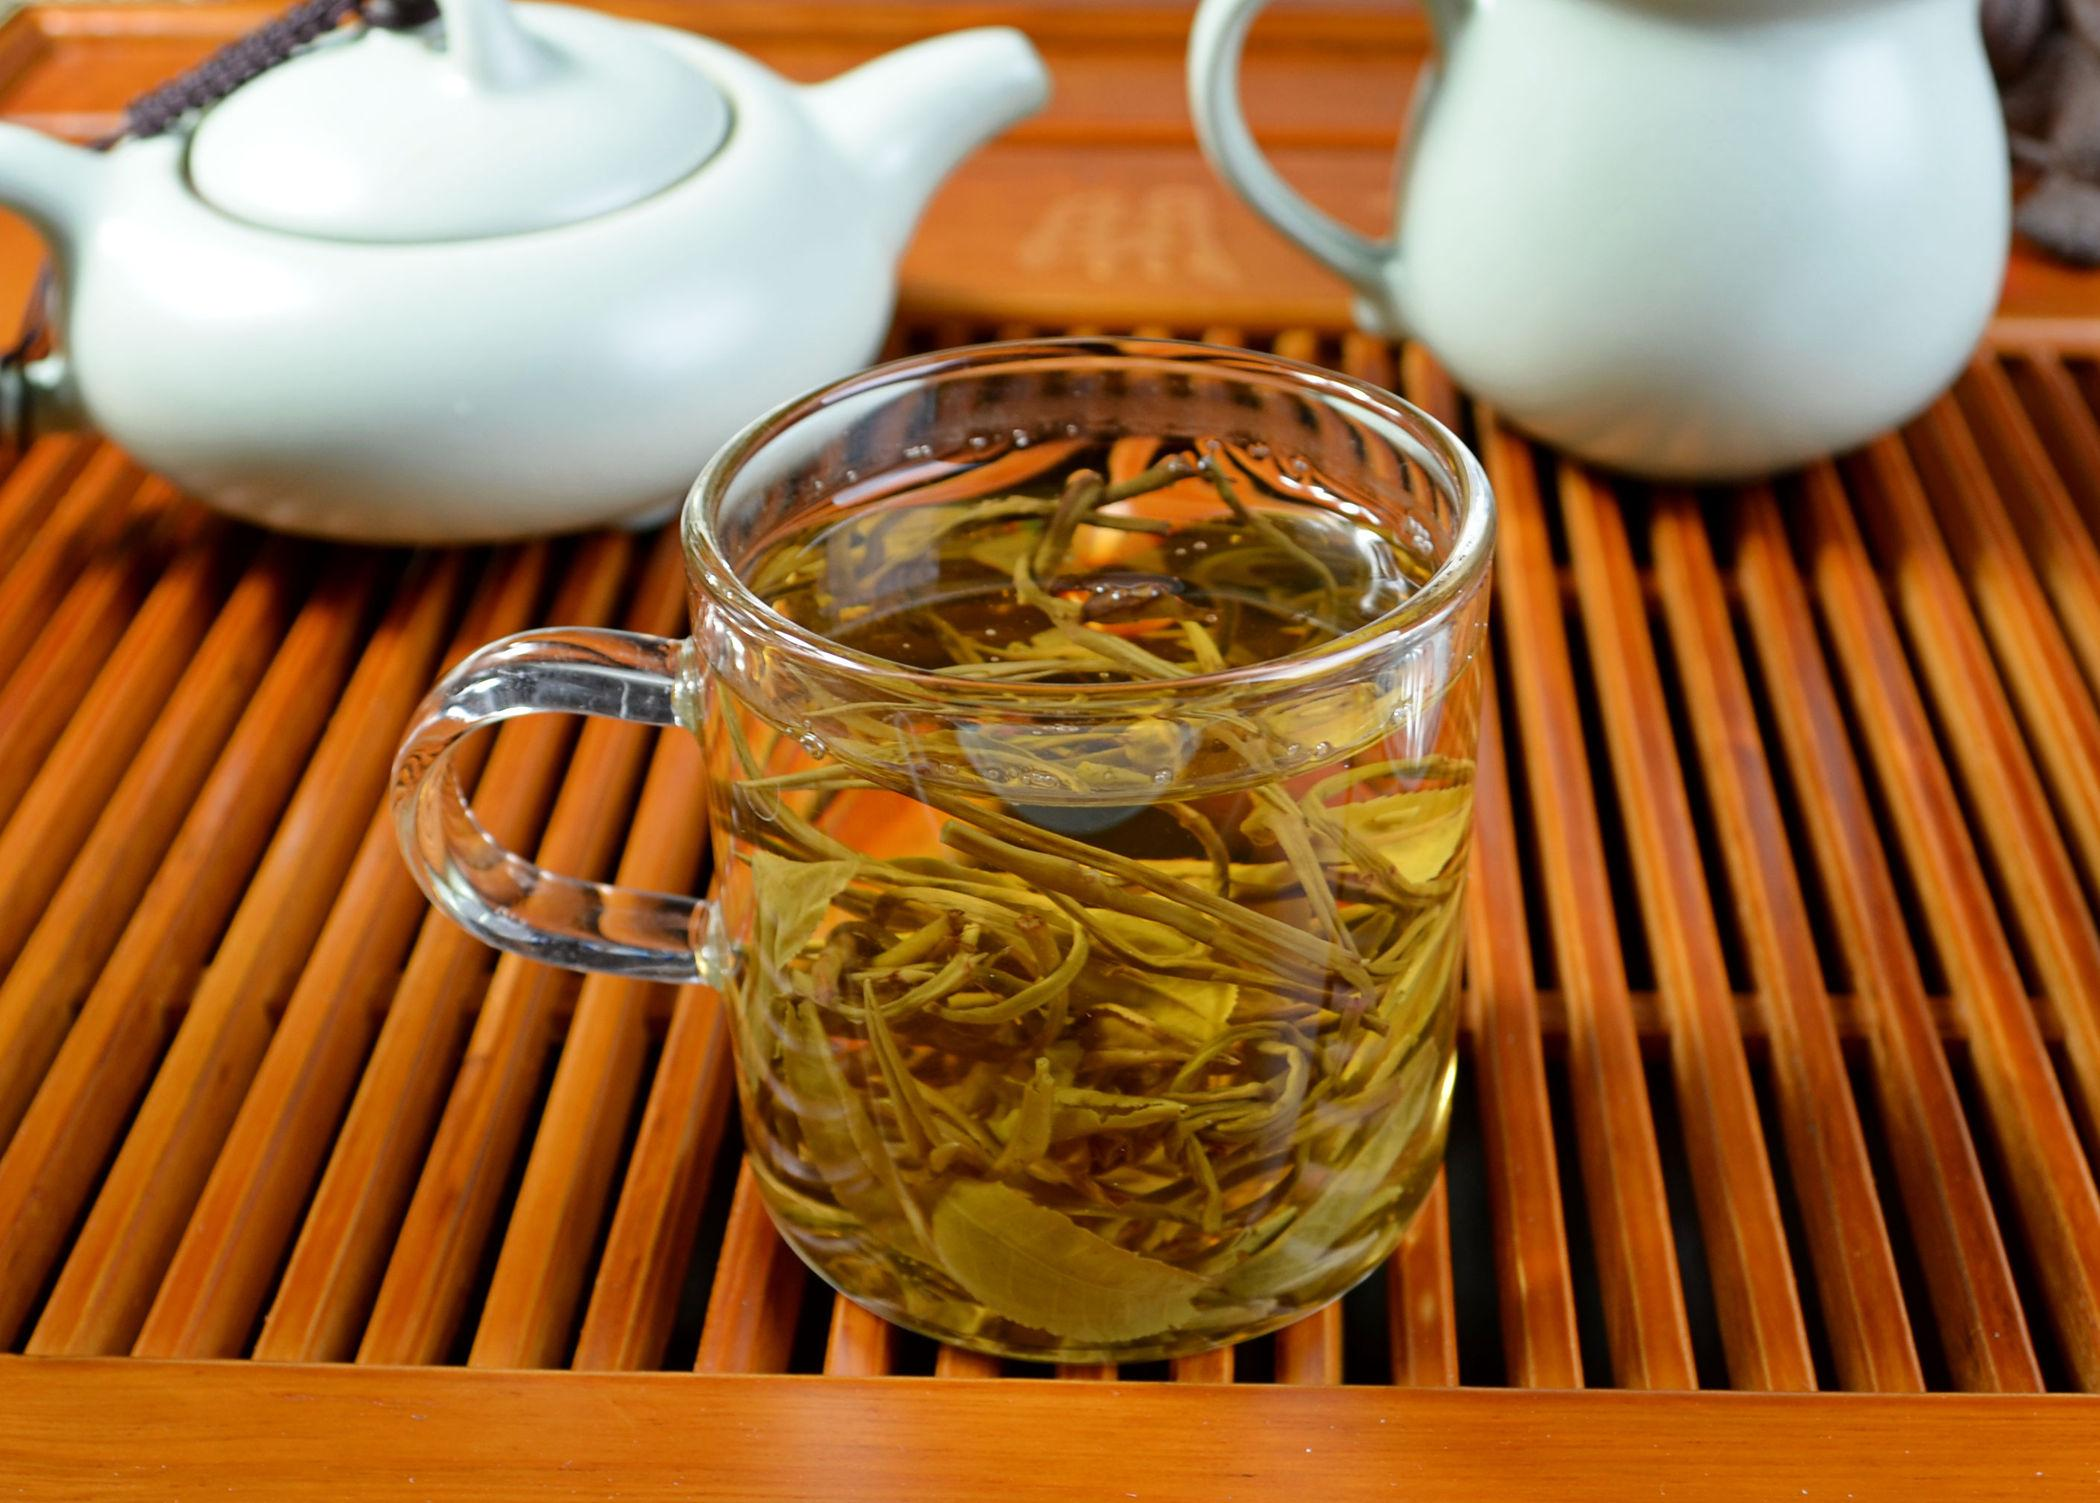 [Classic] Lots Jasmine Dragon Pearl Tea Dried Organic Loose Leaf Balls Green Tea[Classic] Lots Jasmine Dragon Pearl Tea Dried Organic Loose Leaf Balls Green Tea